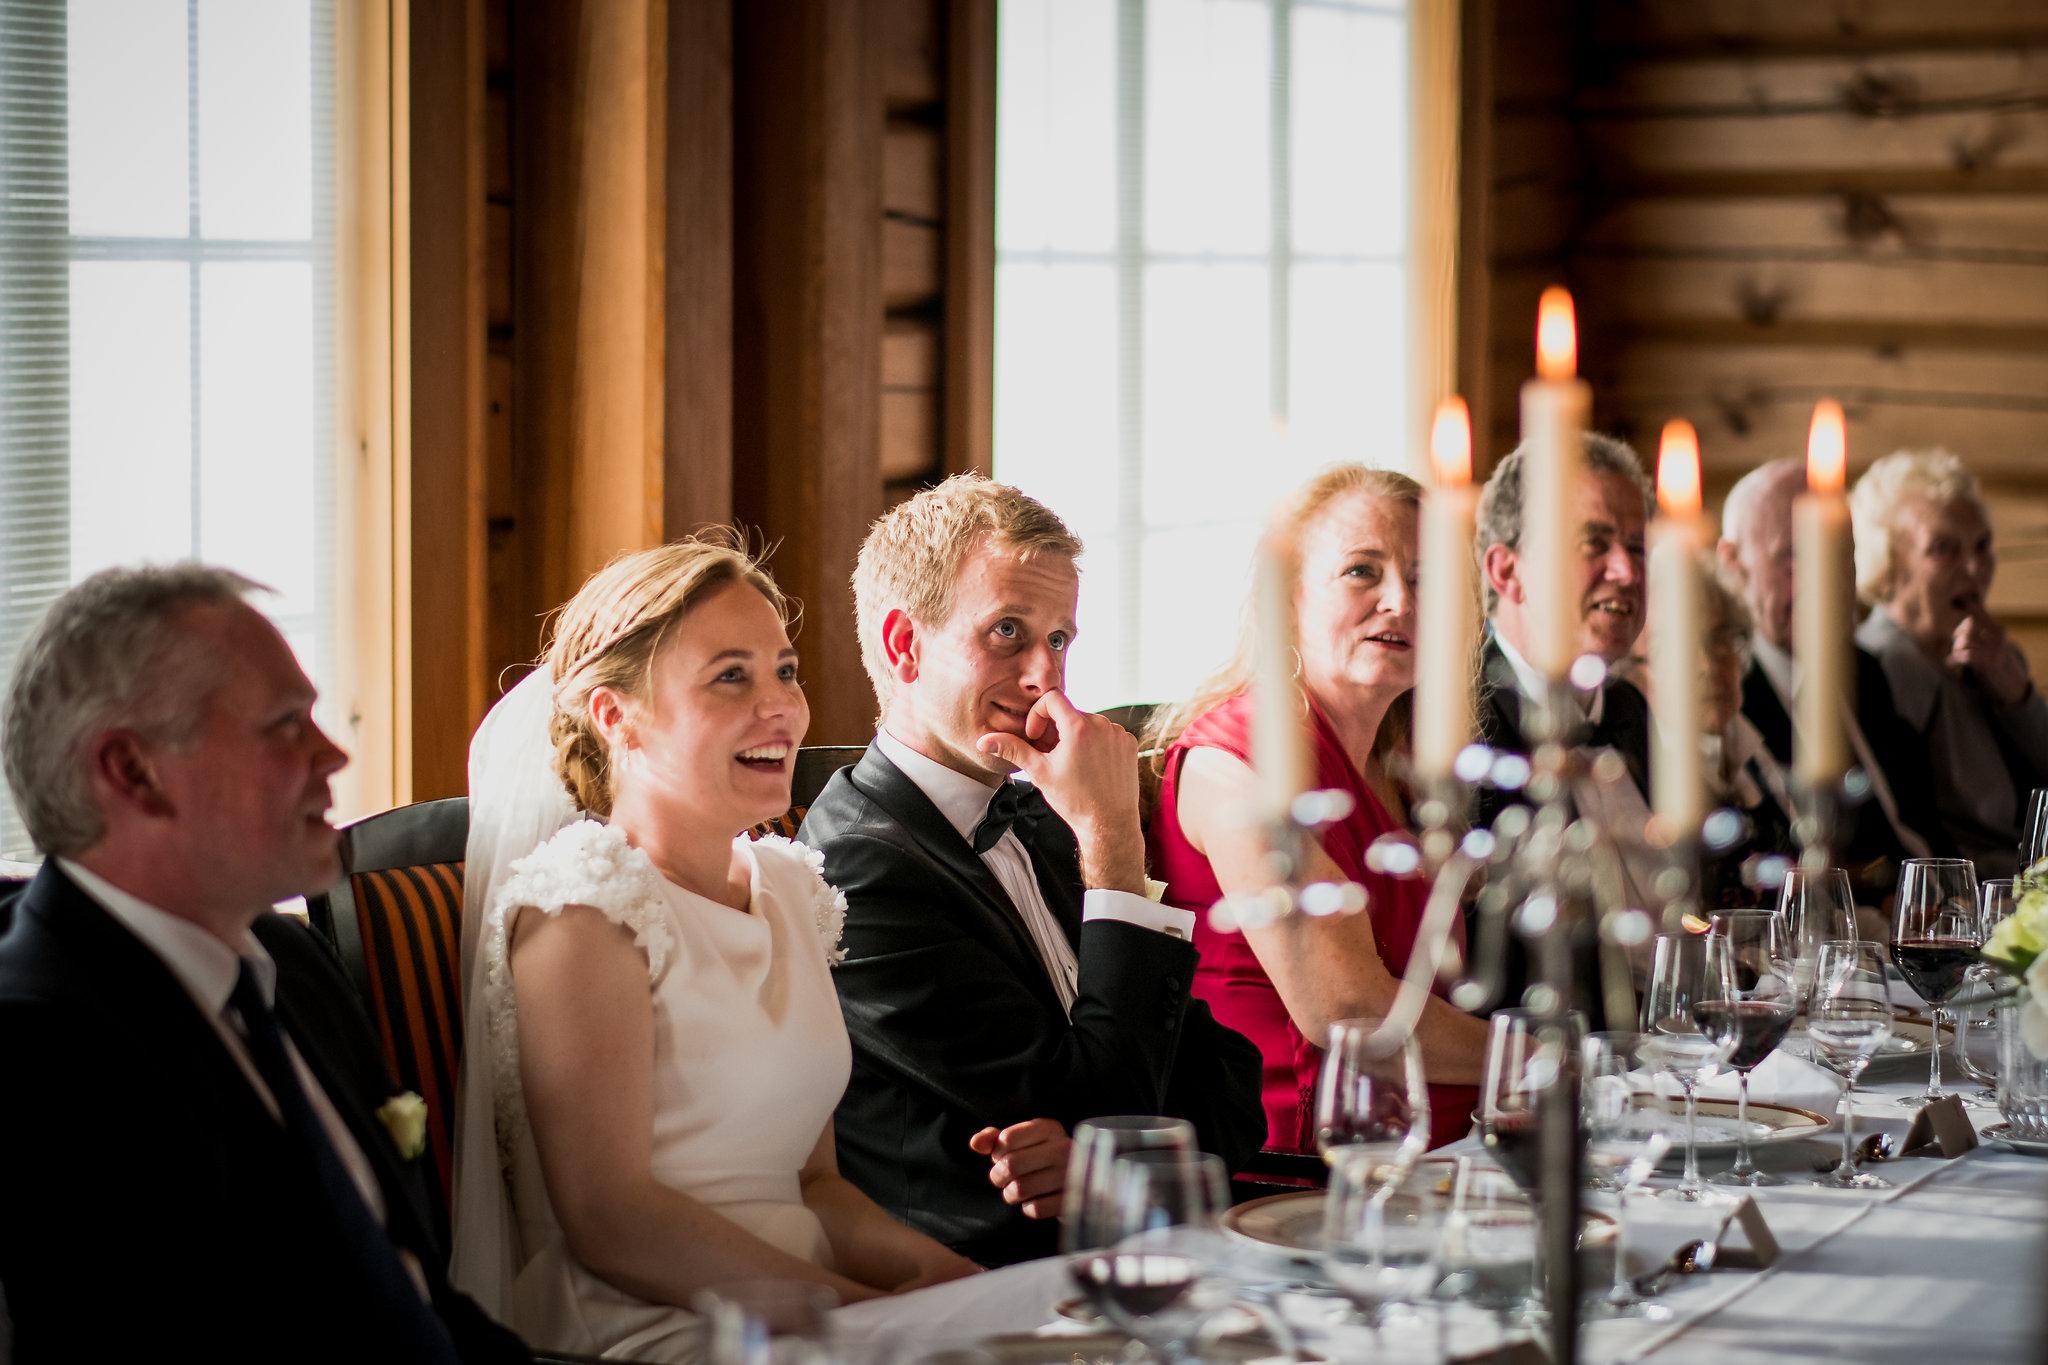 Pixlight-Bryllup-Nina-Thorbjorn1242fotograf-holmekolen-oslo.jpg